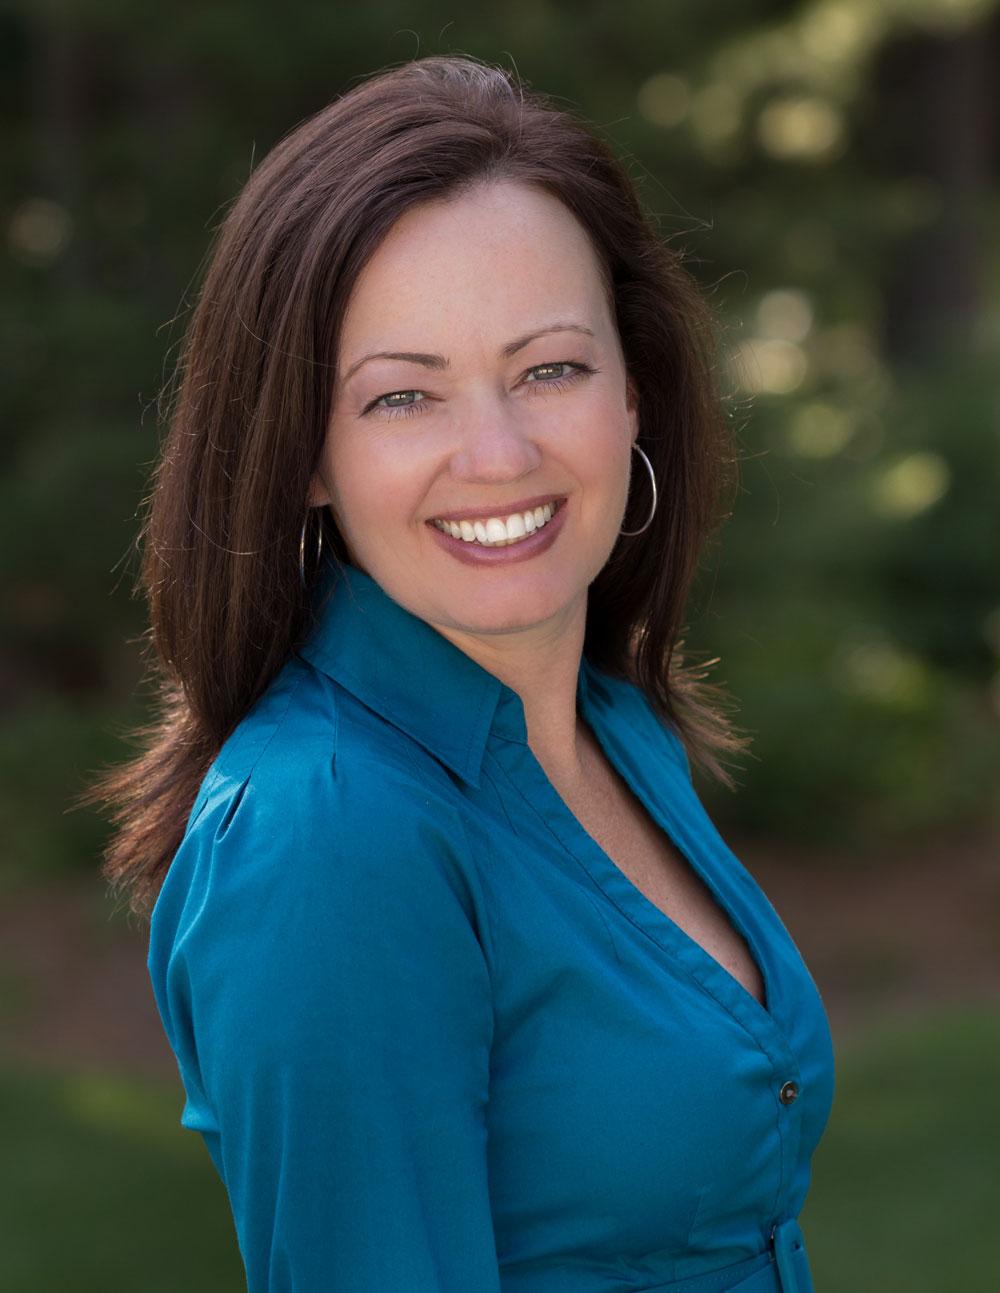 Jennifer-Remondino-Outgoing Chamber Board Chair 2019-20